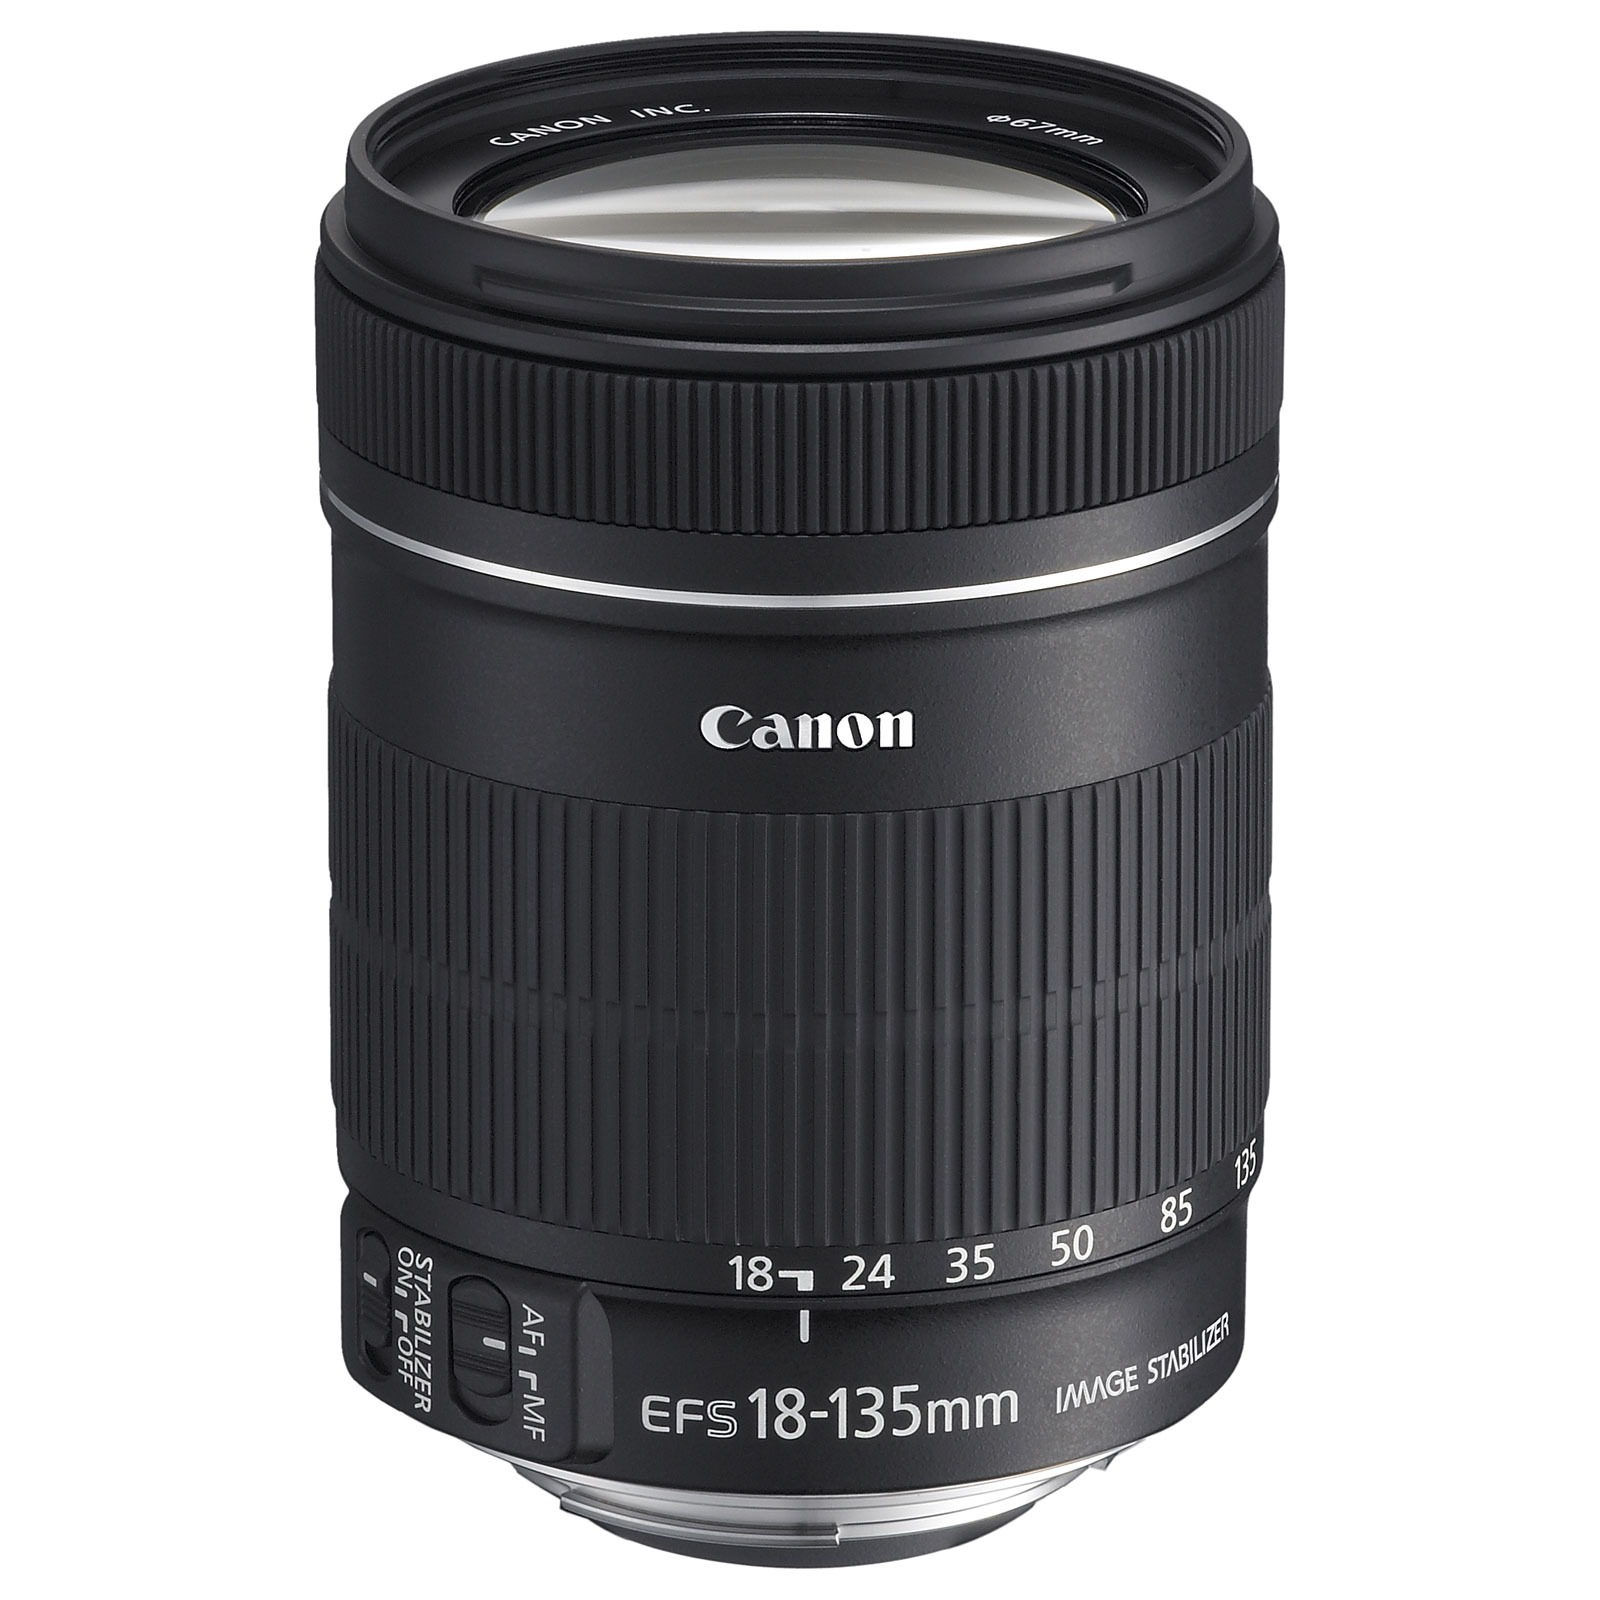 Objectif appareil photo Canon EF-S 18-135mm f/3.5-5.6 IS Zoom transtandard stabilisé